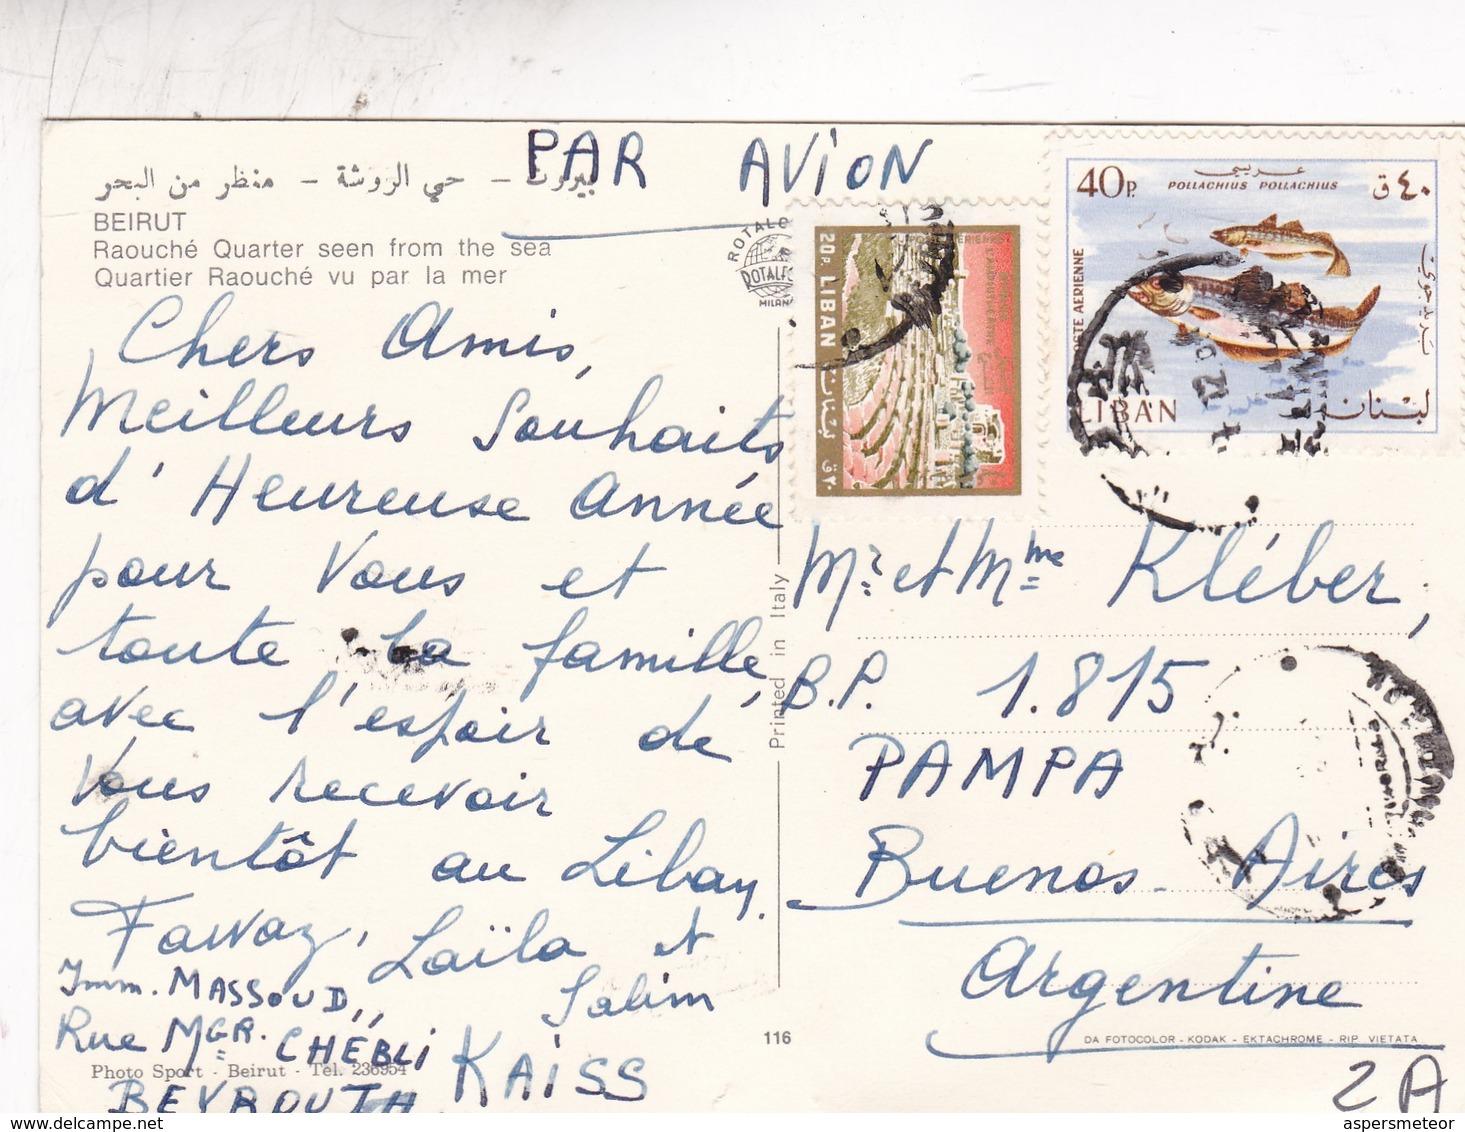 BEIRUT. RAOUCHE QUARTER SEEN FROM THE SEA. ROTALCOLOR. CIRCULEE 1964 A BUENOS AIRES - BLEUP - Liban